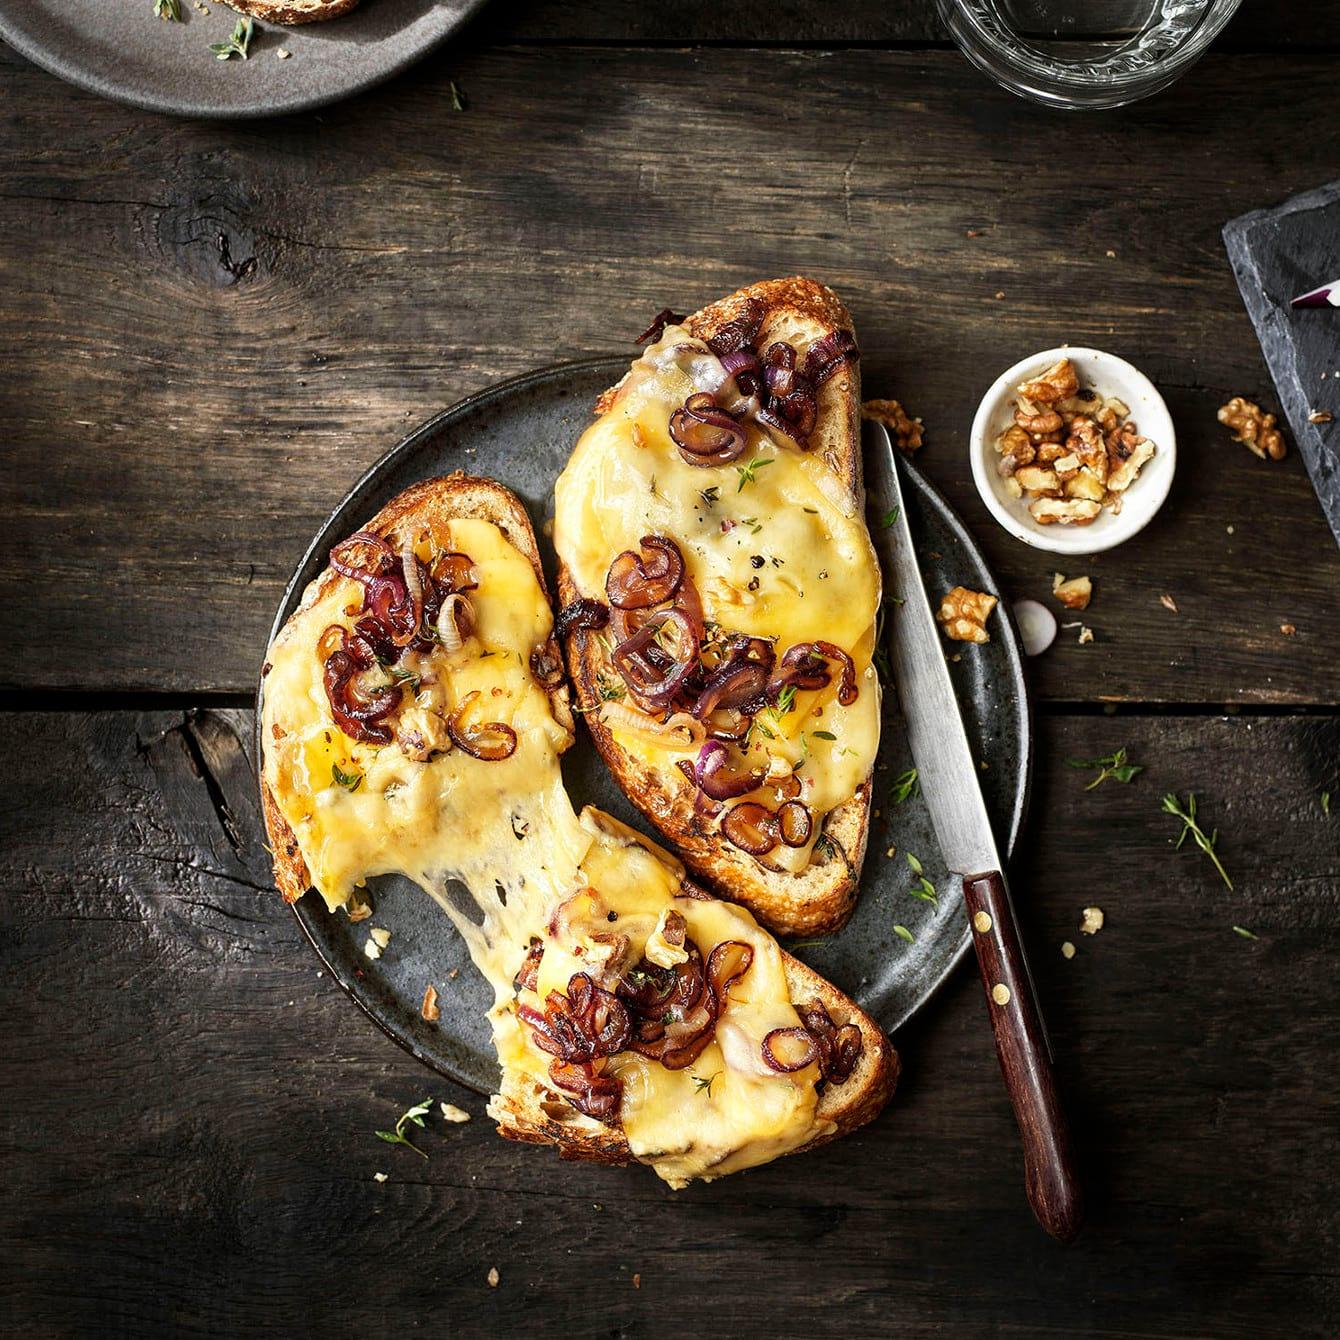 Melted sandwich met Old Amsterdam Belegen, gekaramelliseerde ui, walnoten en tijm